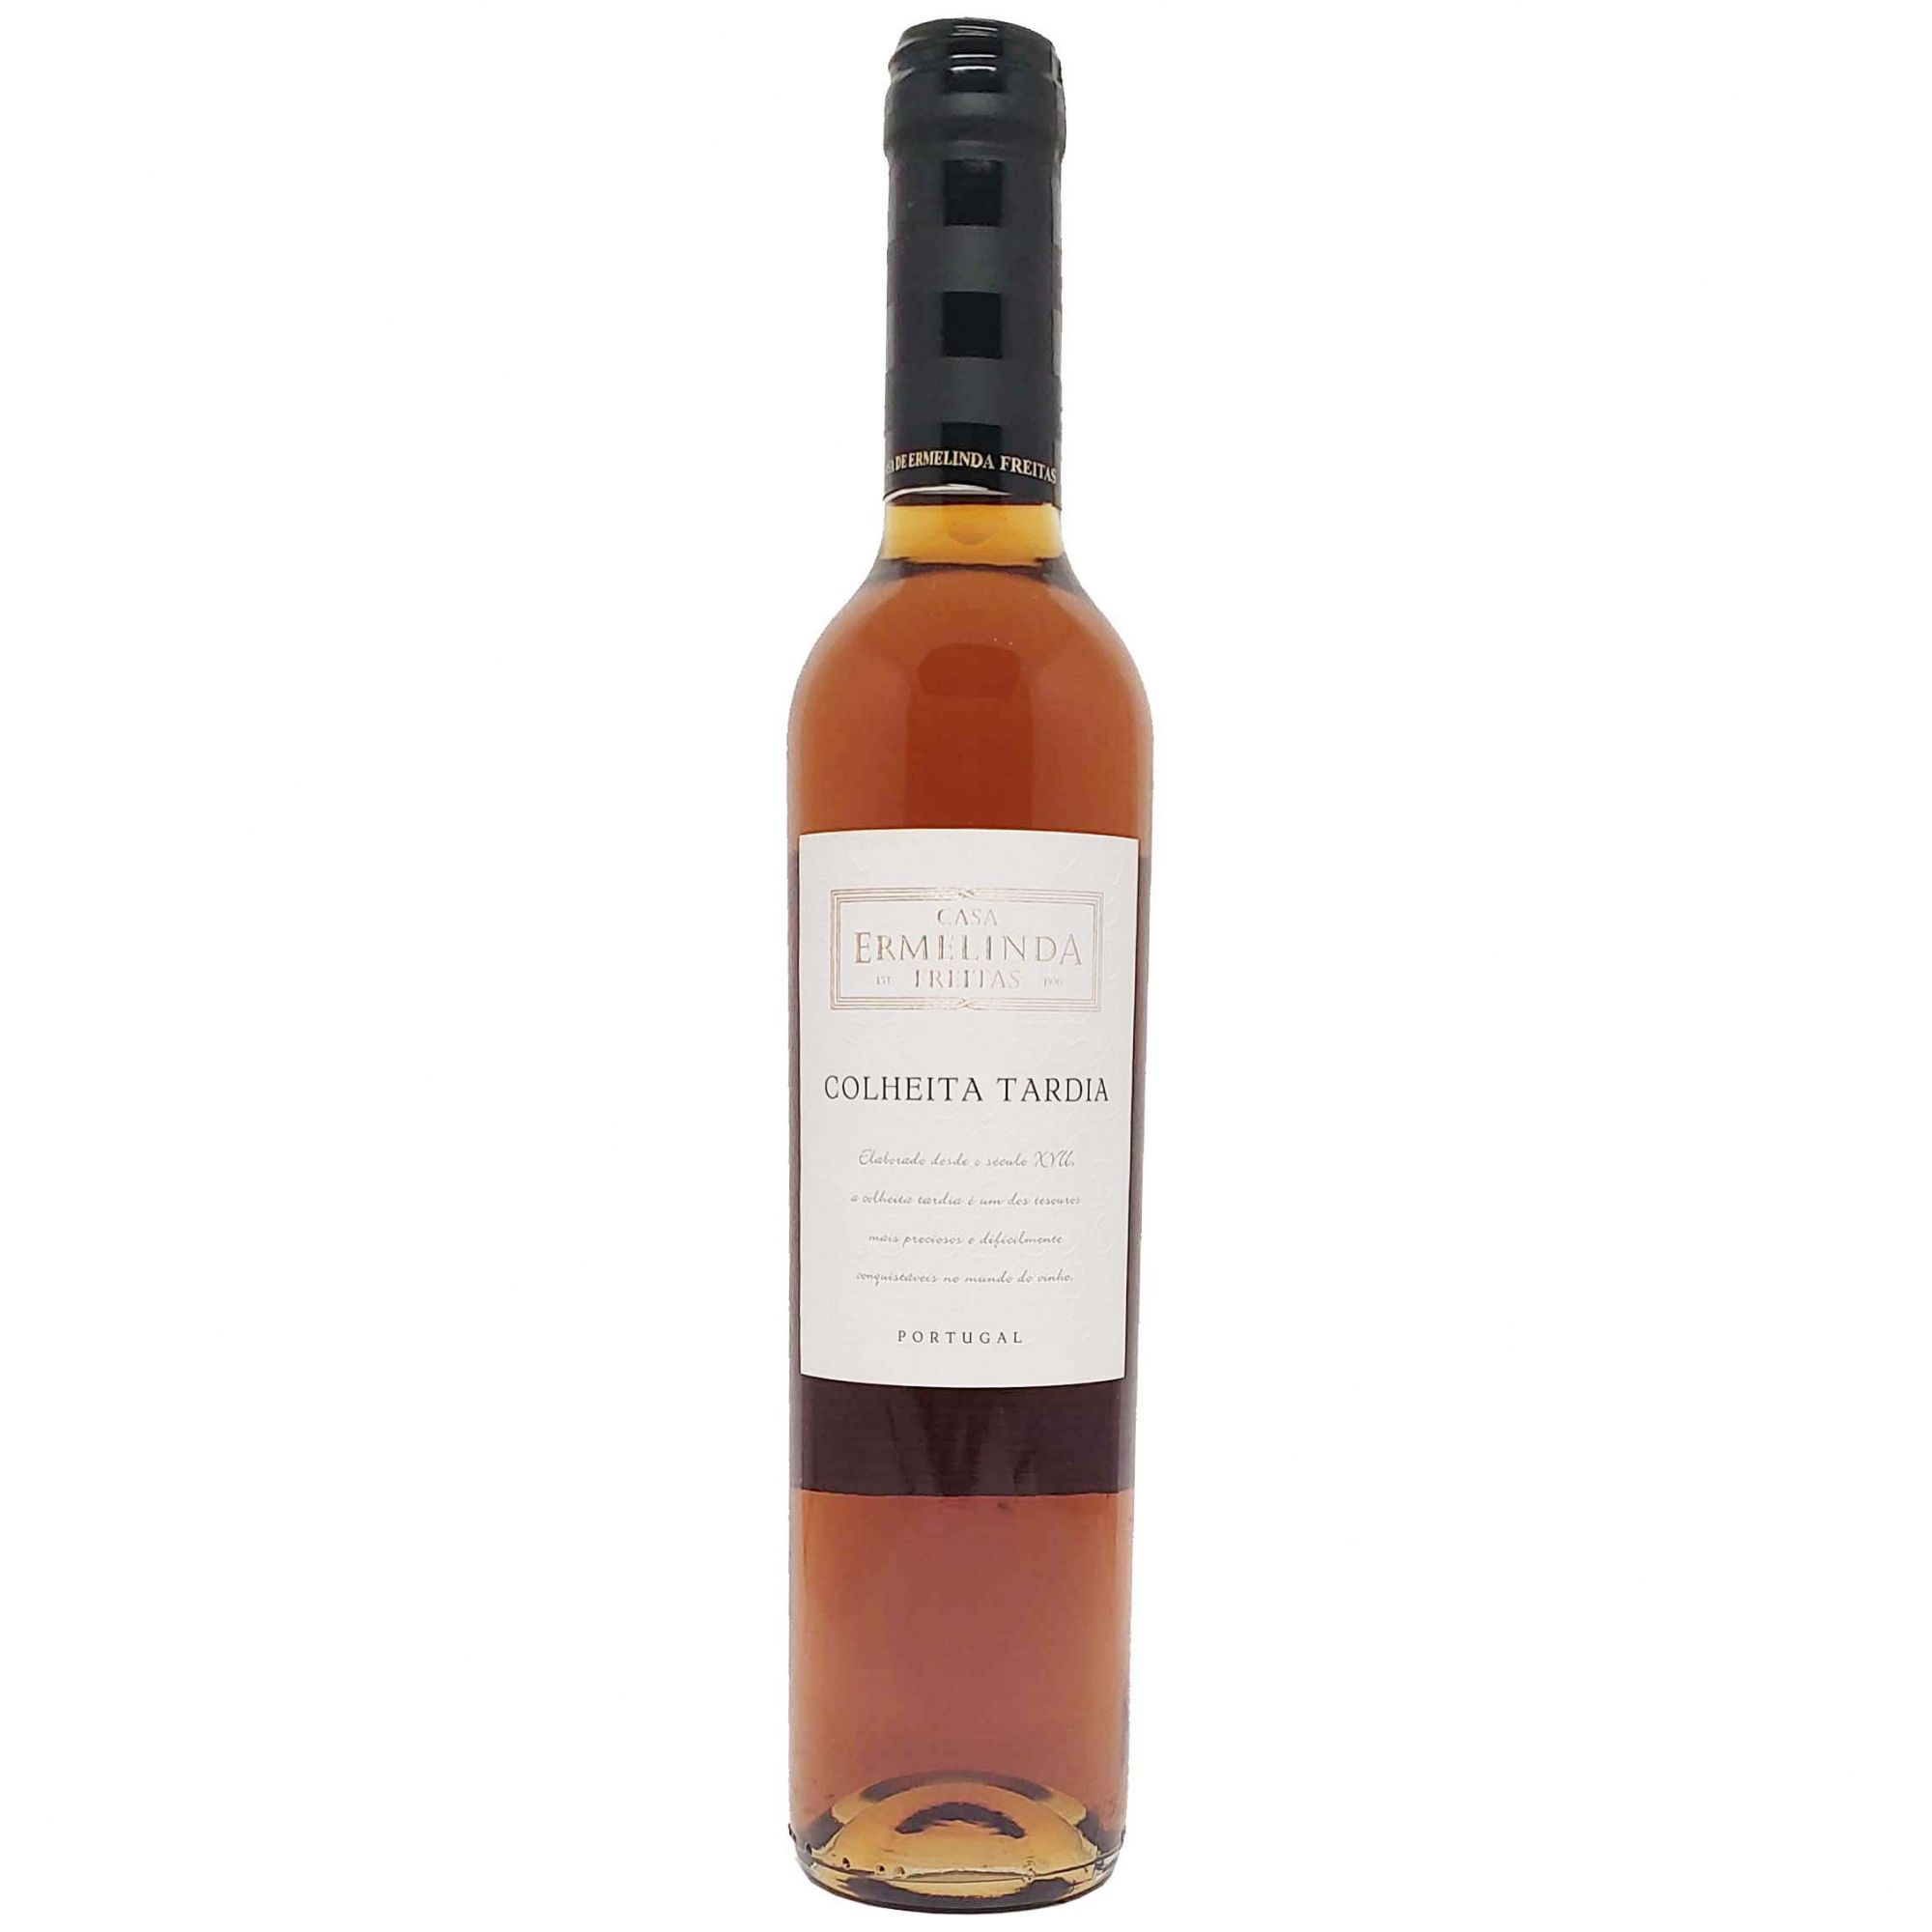 Vinho Branco Doce Casa Ermelinda Freitas Colheita Tardia  - 500ml -